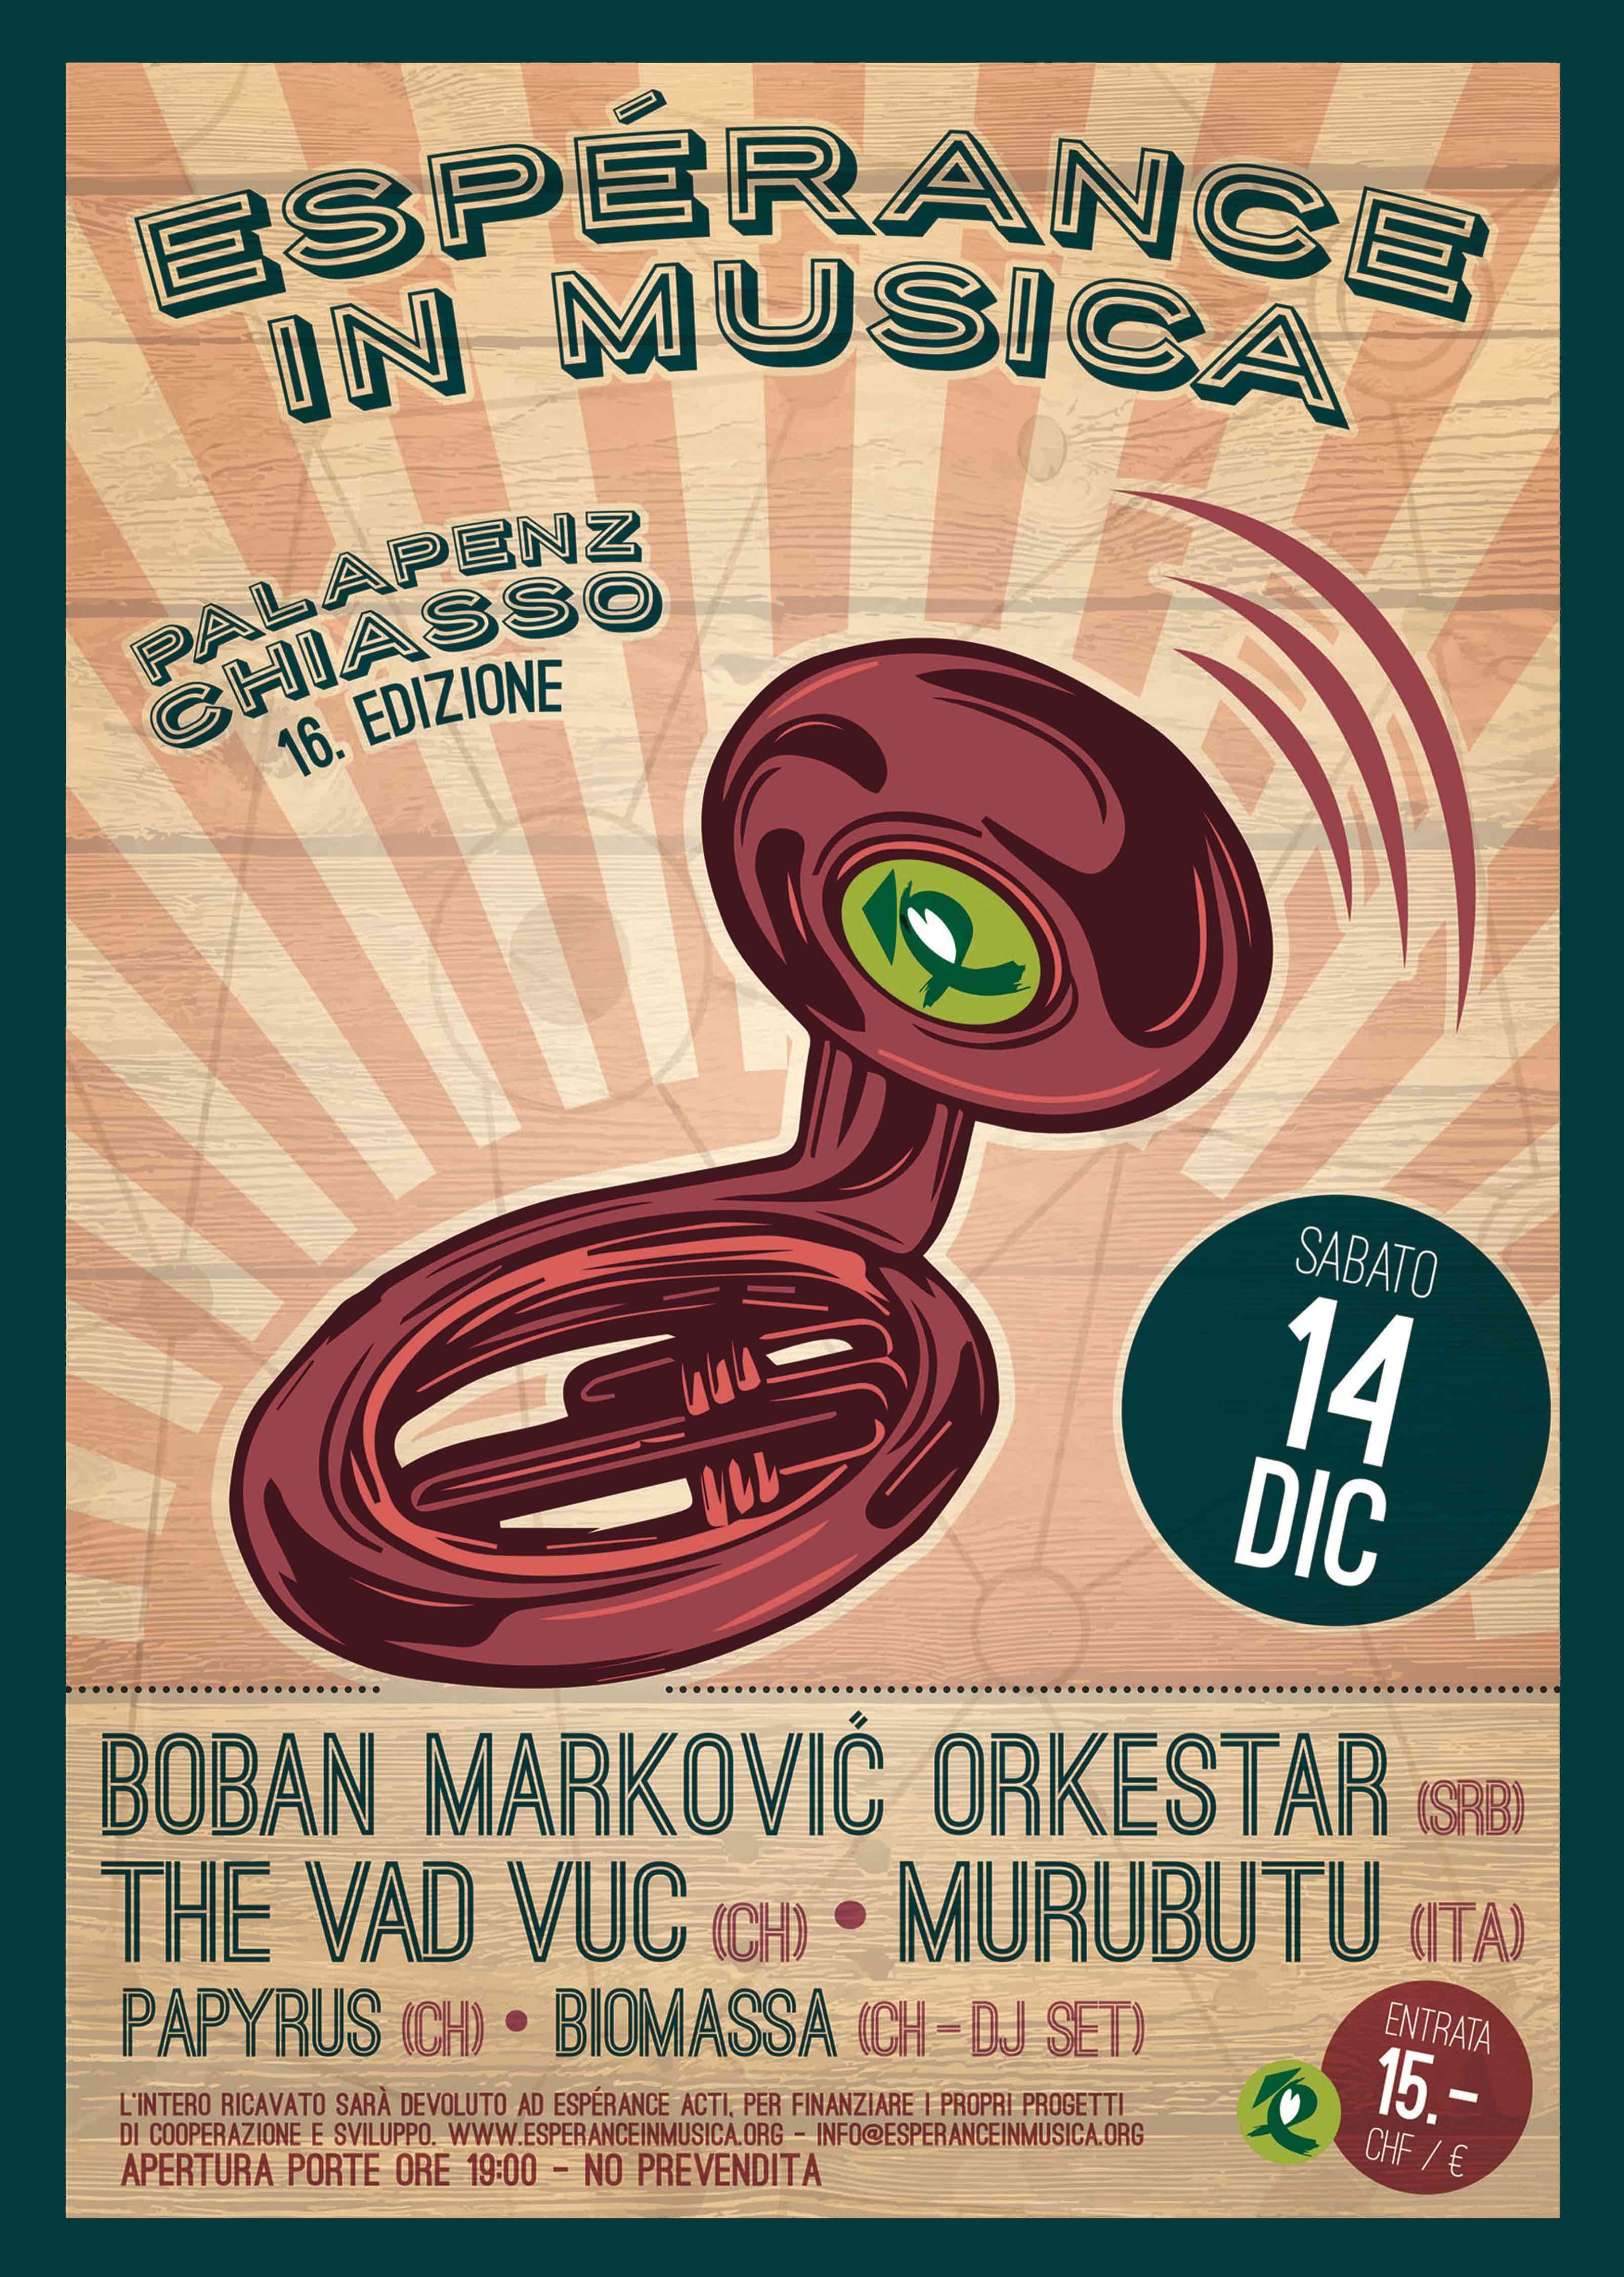 Esperance 2019 - Boban Markovic Orkestar